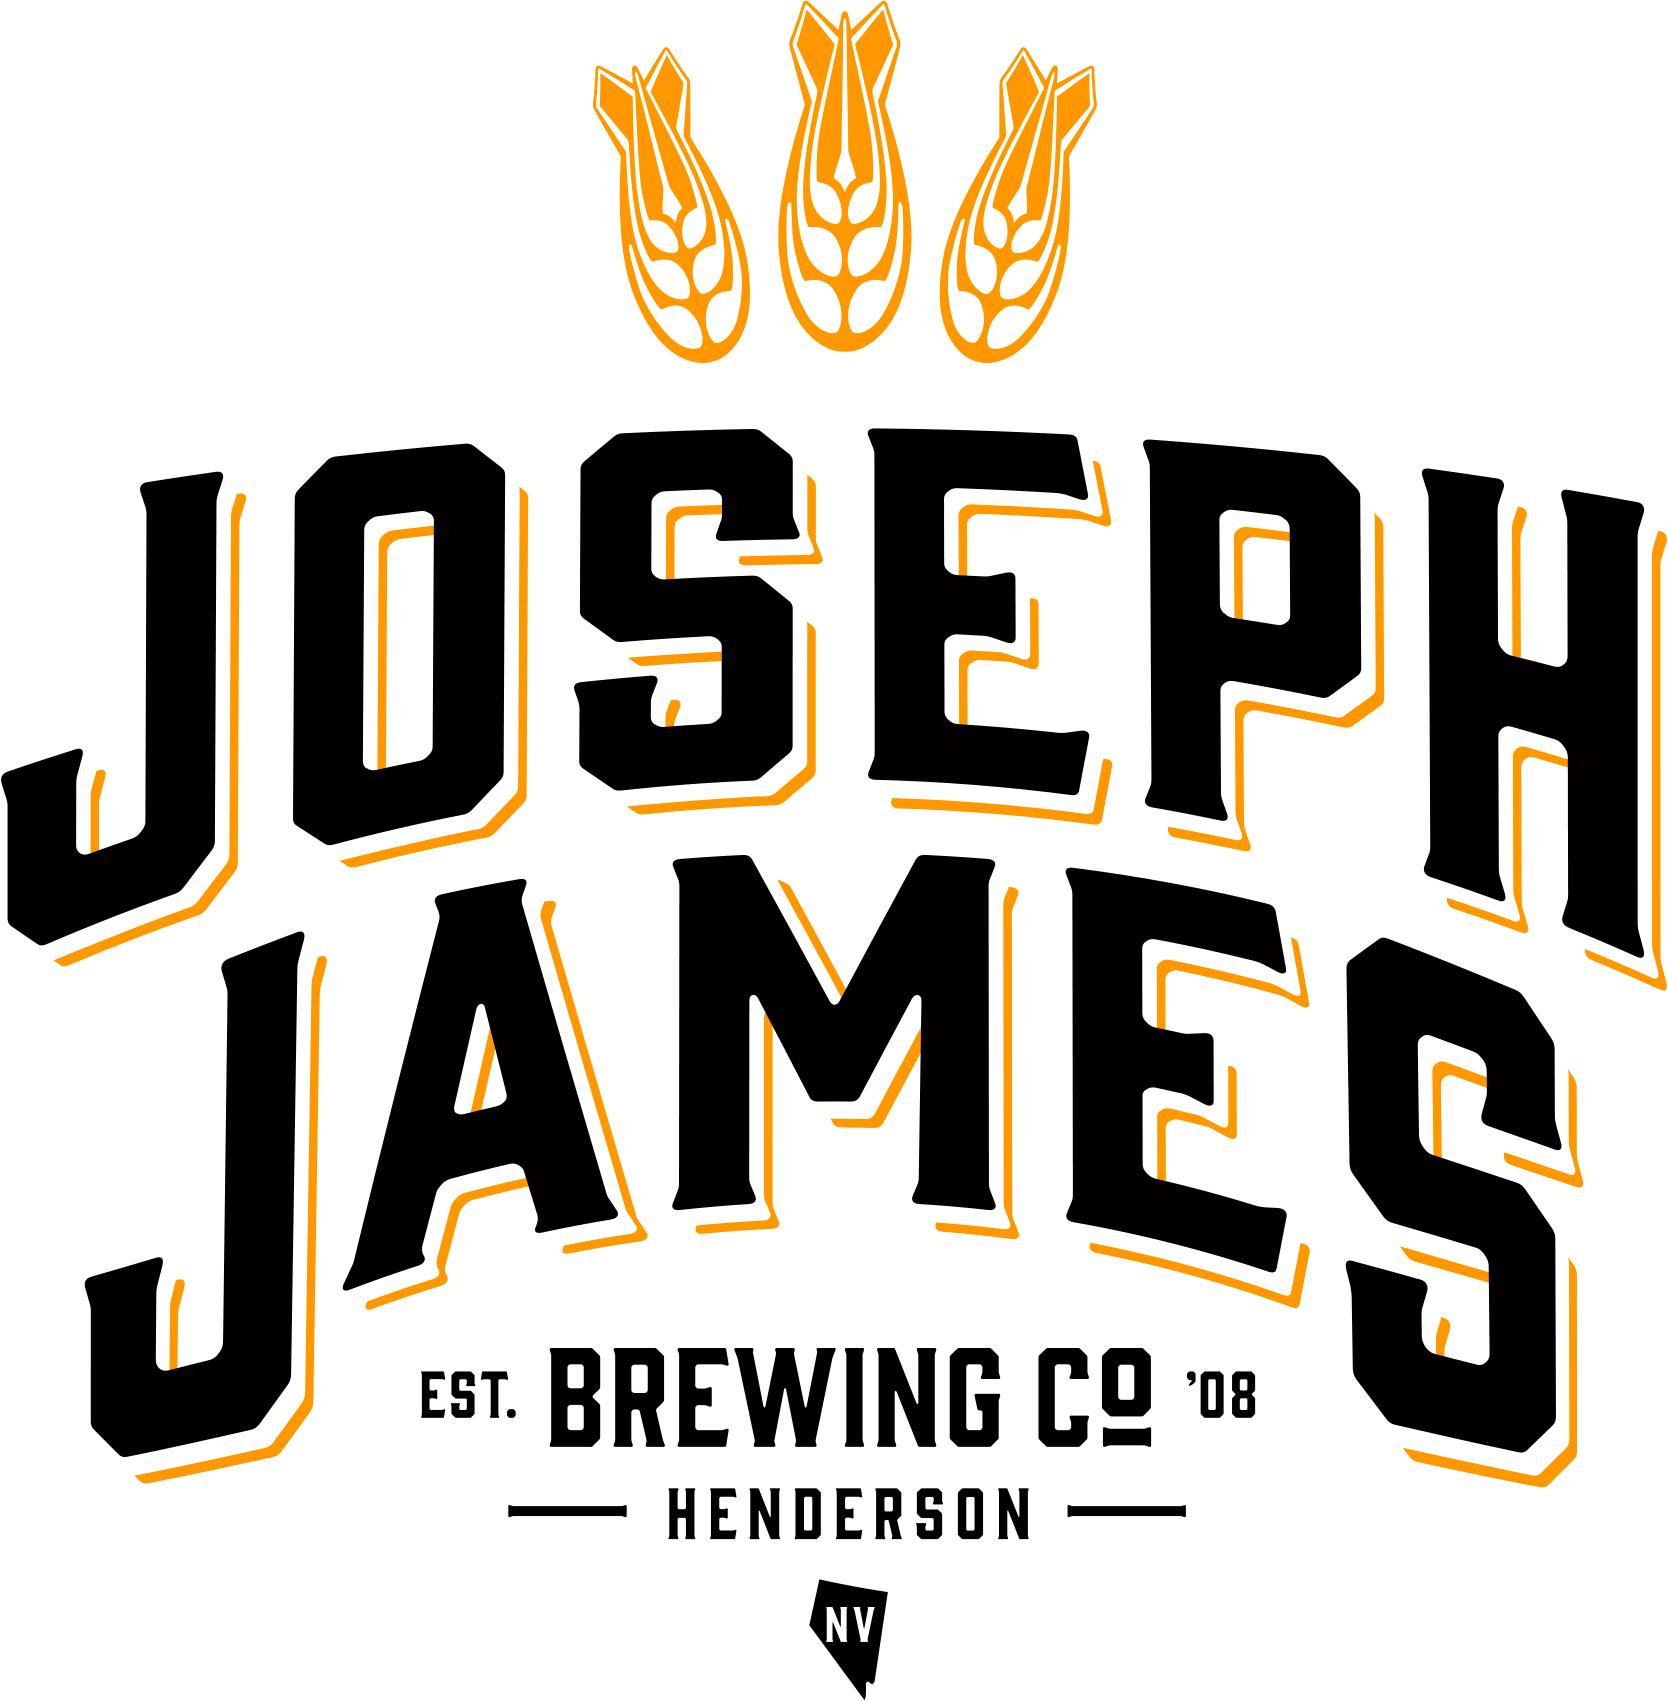 Joseph James Brewing Company | Henderson, NV